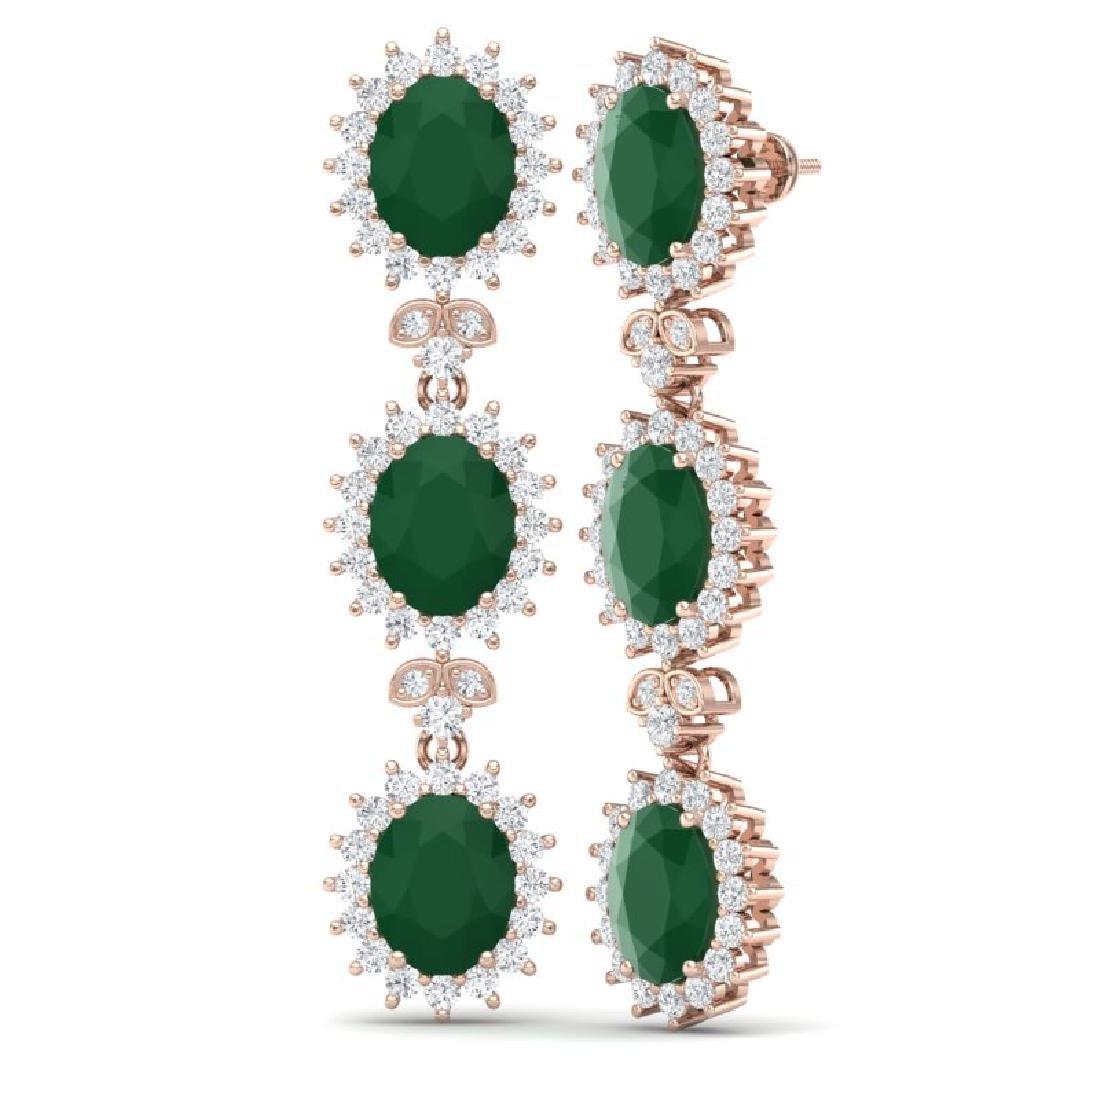 24.52 CTW Royalty Emerald & VS Diamond Earrings 18K - 3